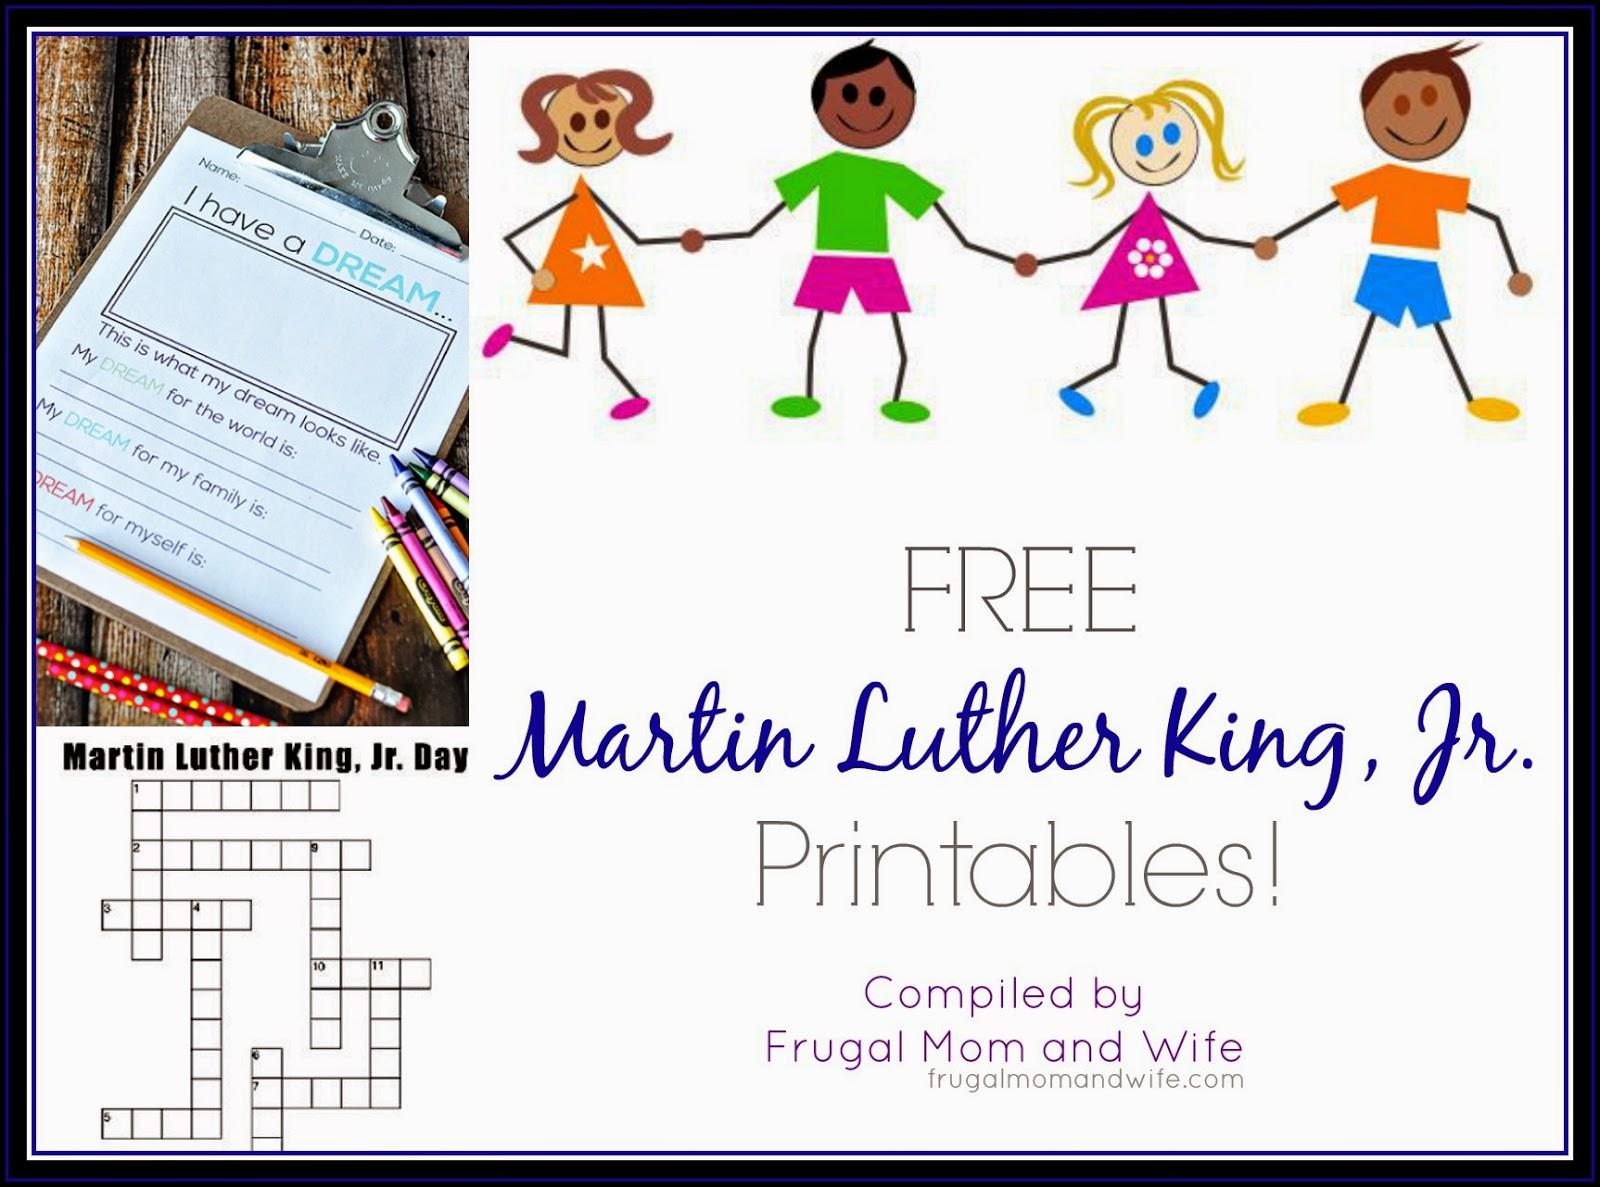 Martin Luther King, Jr. FREEBIE! — Teacher KARMA | 1187x1600